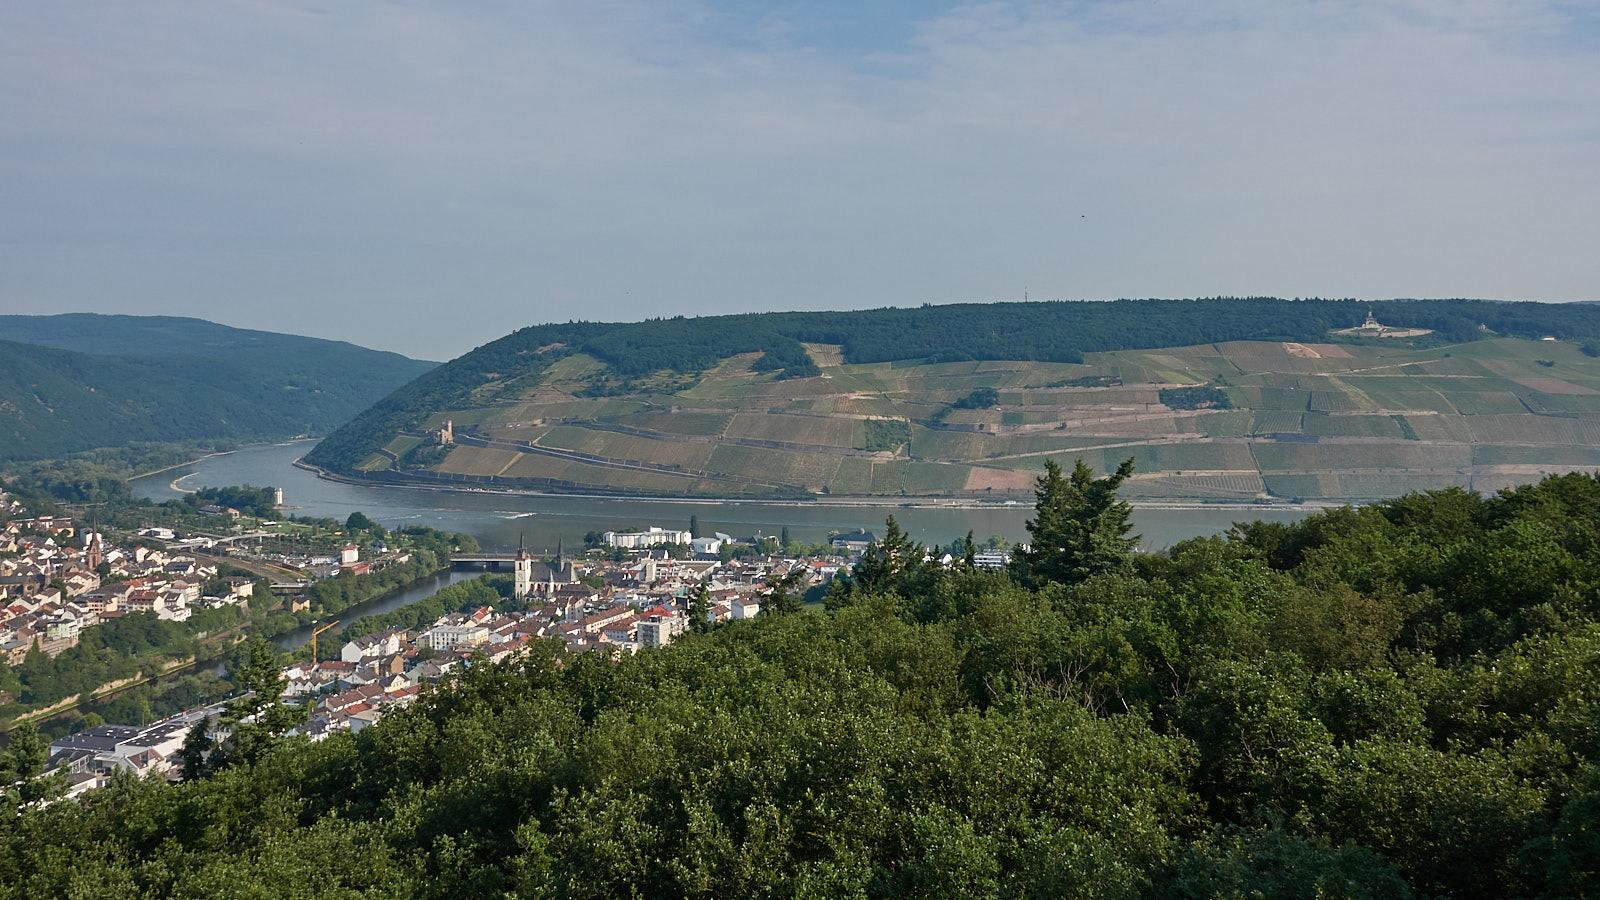 Wandern auf dem Rochusberg bei Bingen mit Rochuskapelle, Bethlehem-Kapelle, Kaiser-Friedrich-Turm...